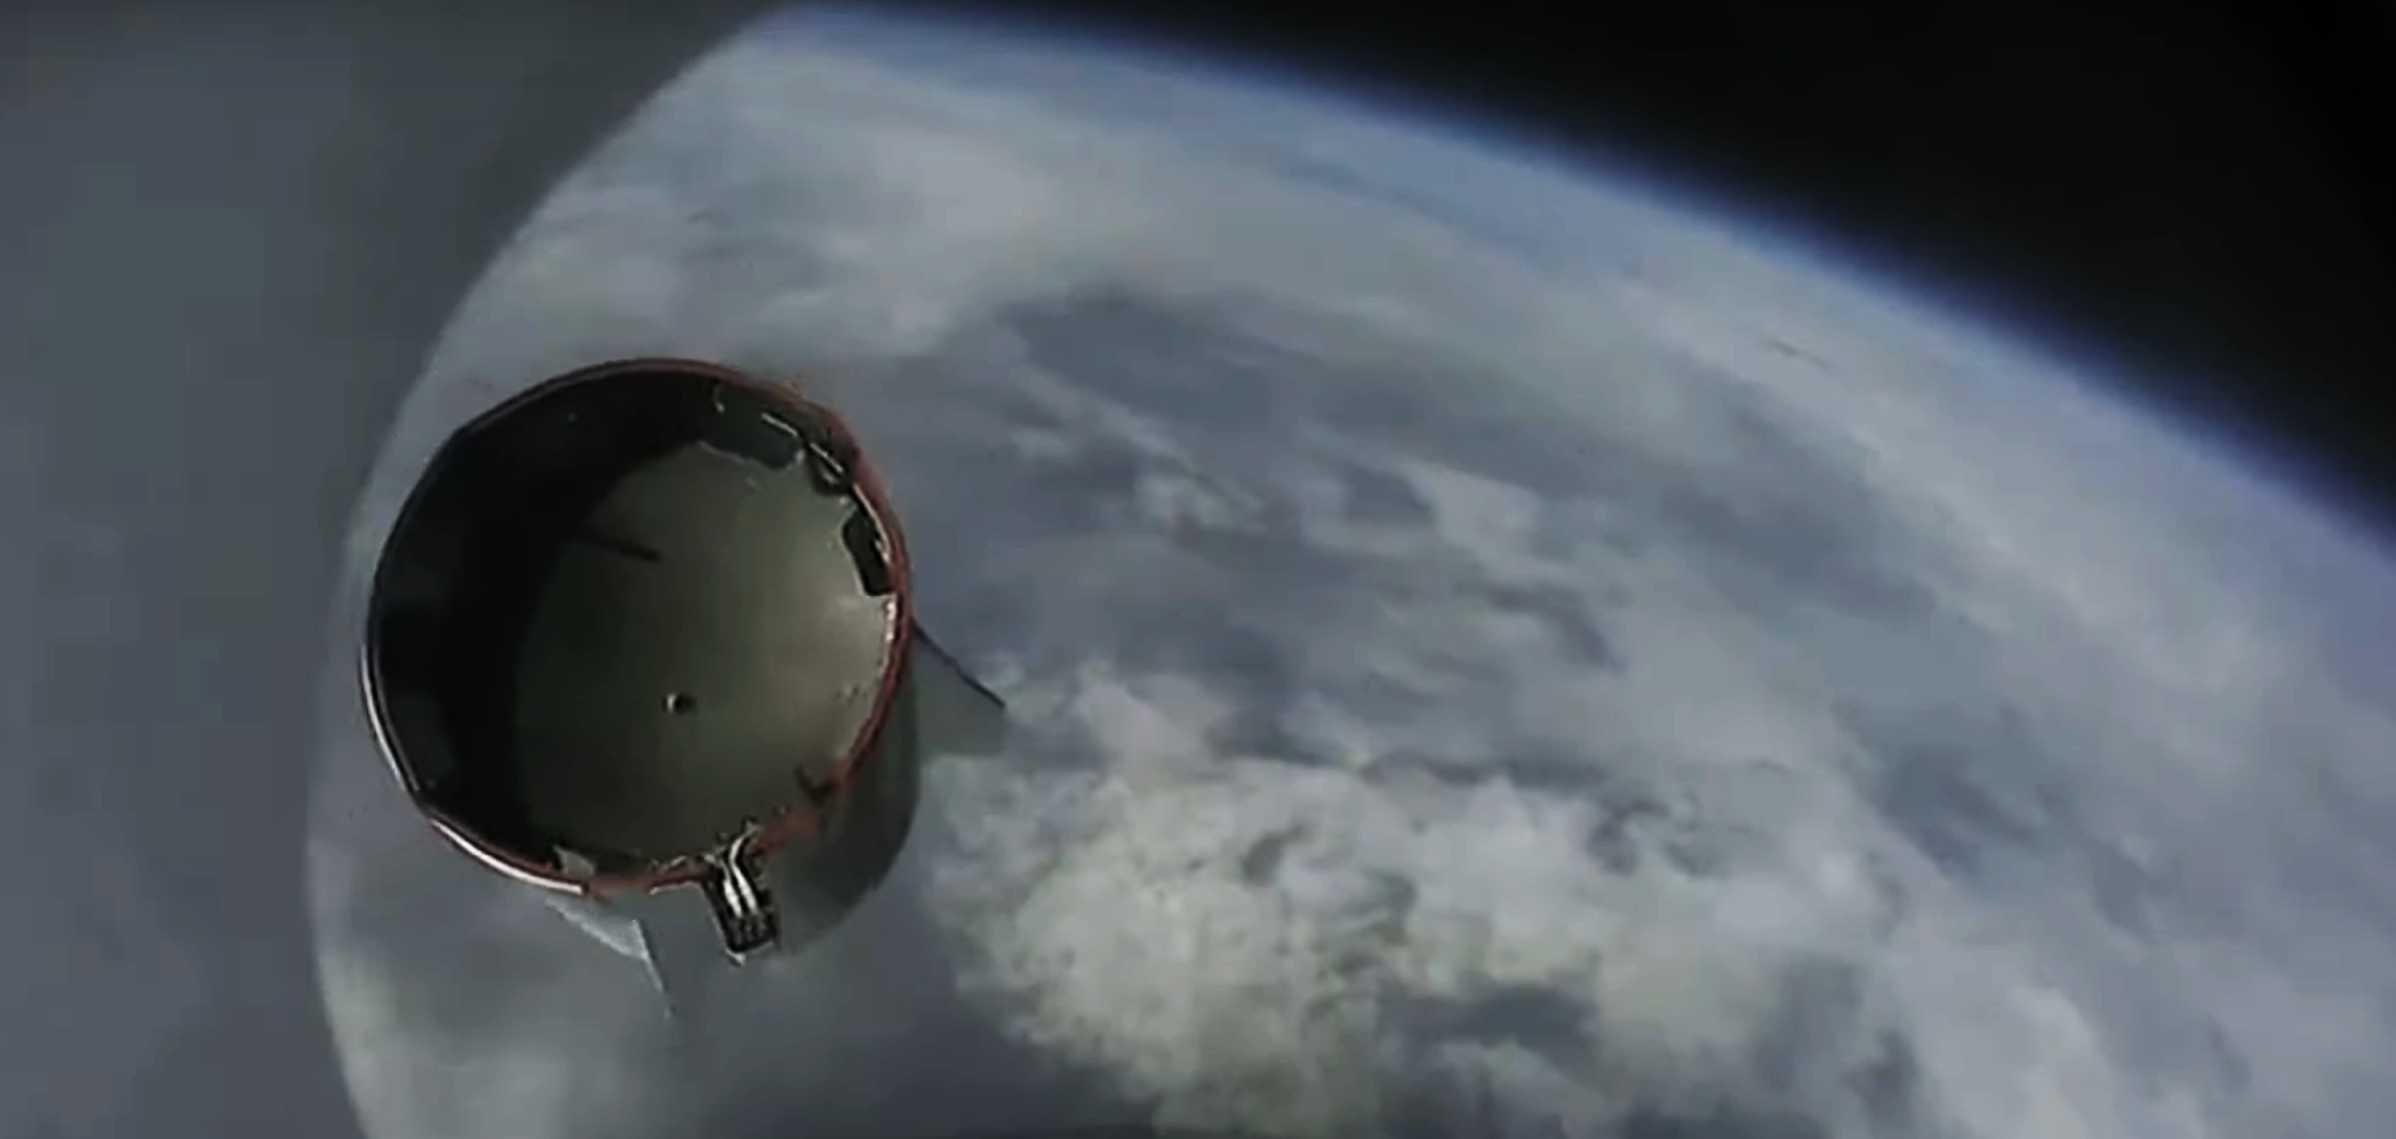 Crew Dragon C205 F9 B1046 IFA webcast (SpaceX) trunk sep 1 crop (c)